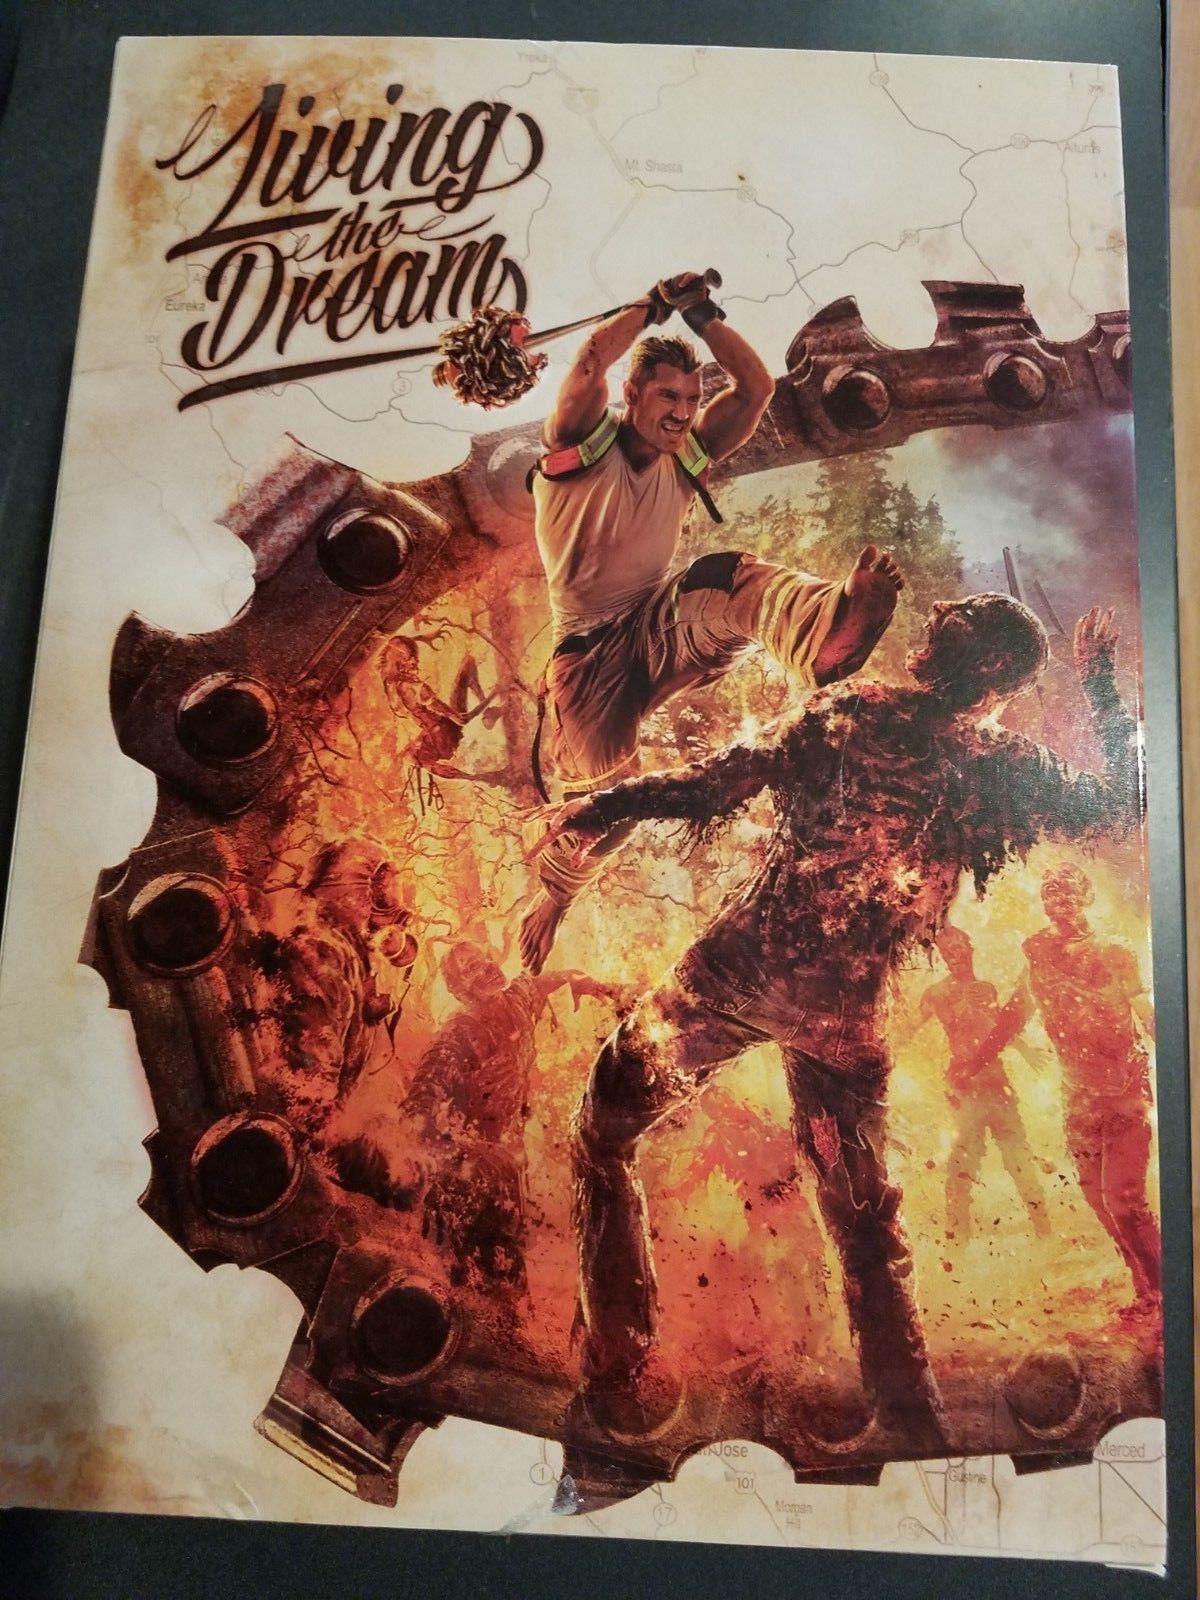 Dead Island 2 Living The Dream Exclusive Zombie Figure - $29.39